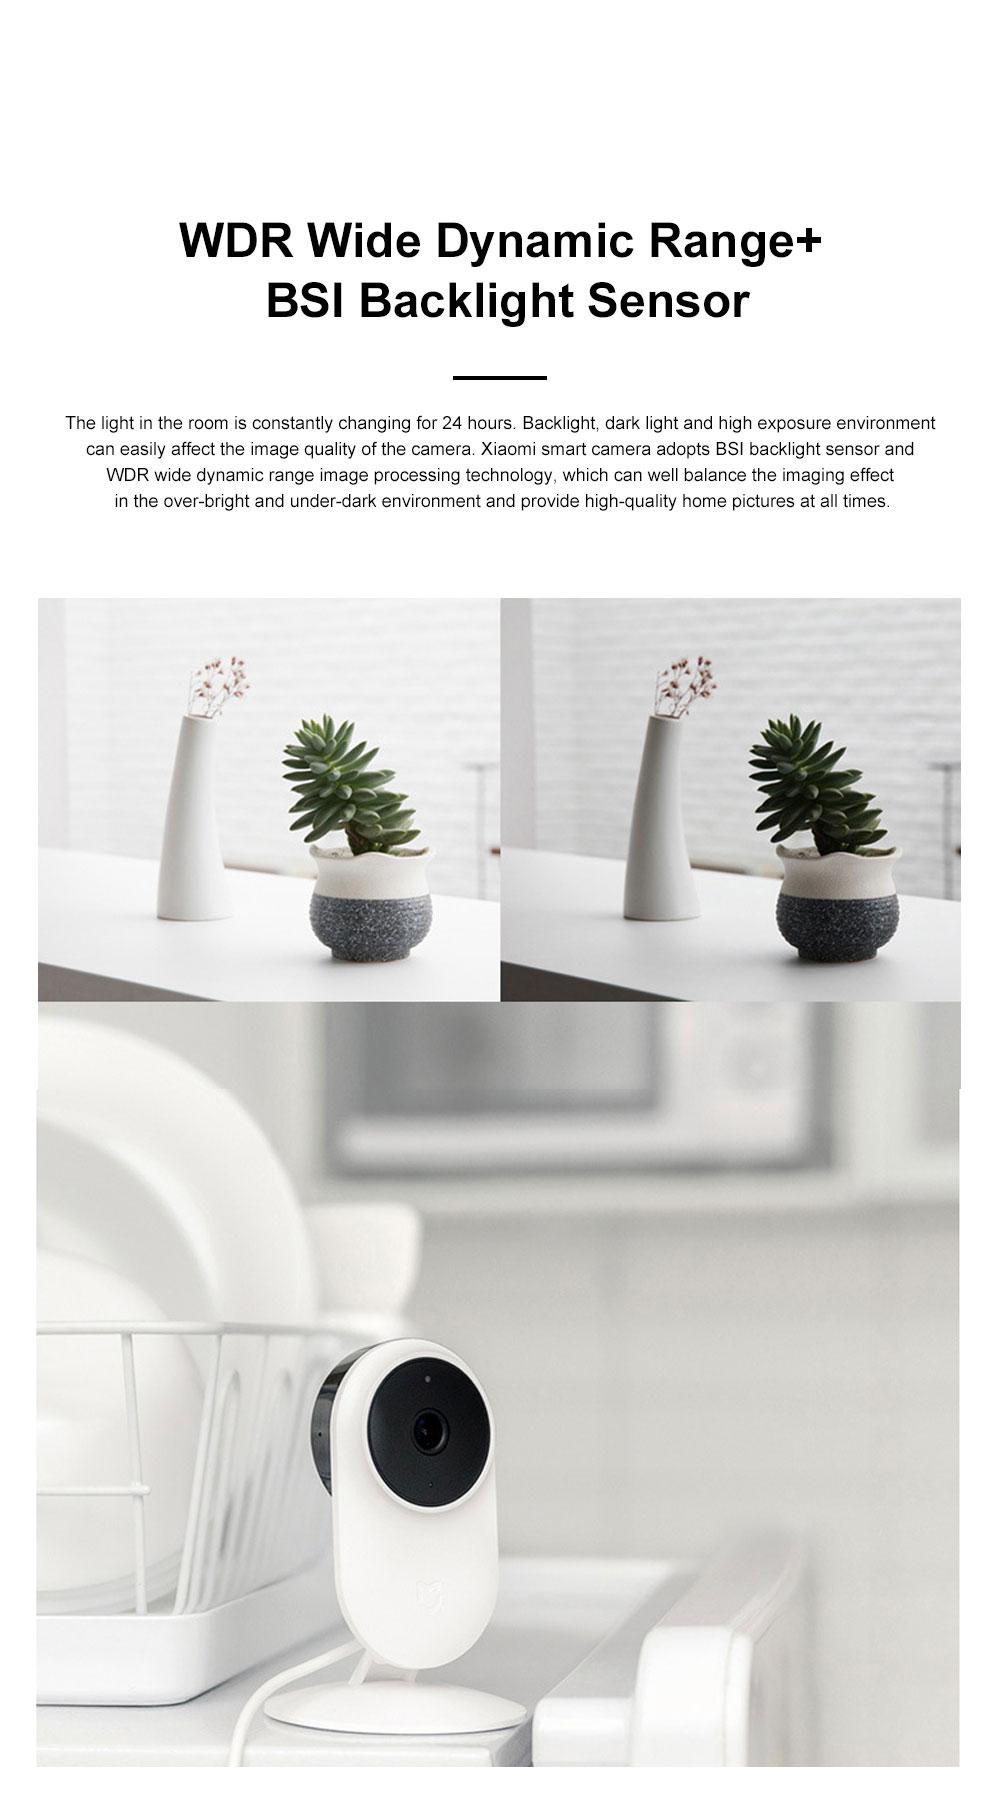 Xiaomi Wireless Smart Camera 1080P Home Monitoring Micro Infrared Night Vision HD Camera Security Camera Baby Monitor 5